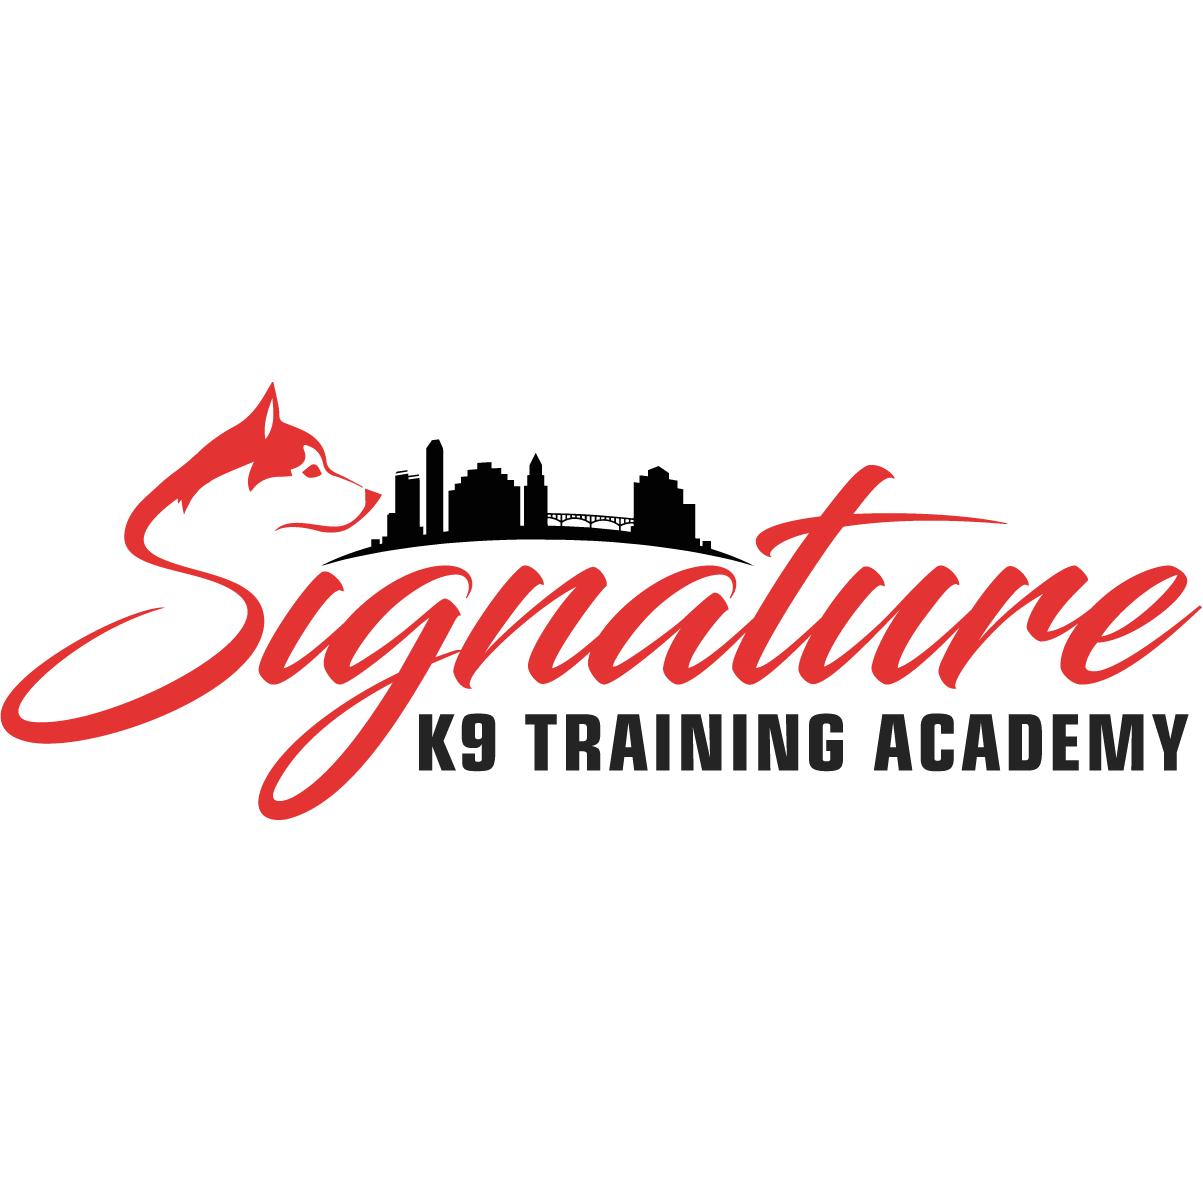 Signature K9 Training Academy